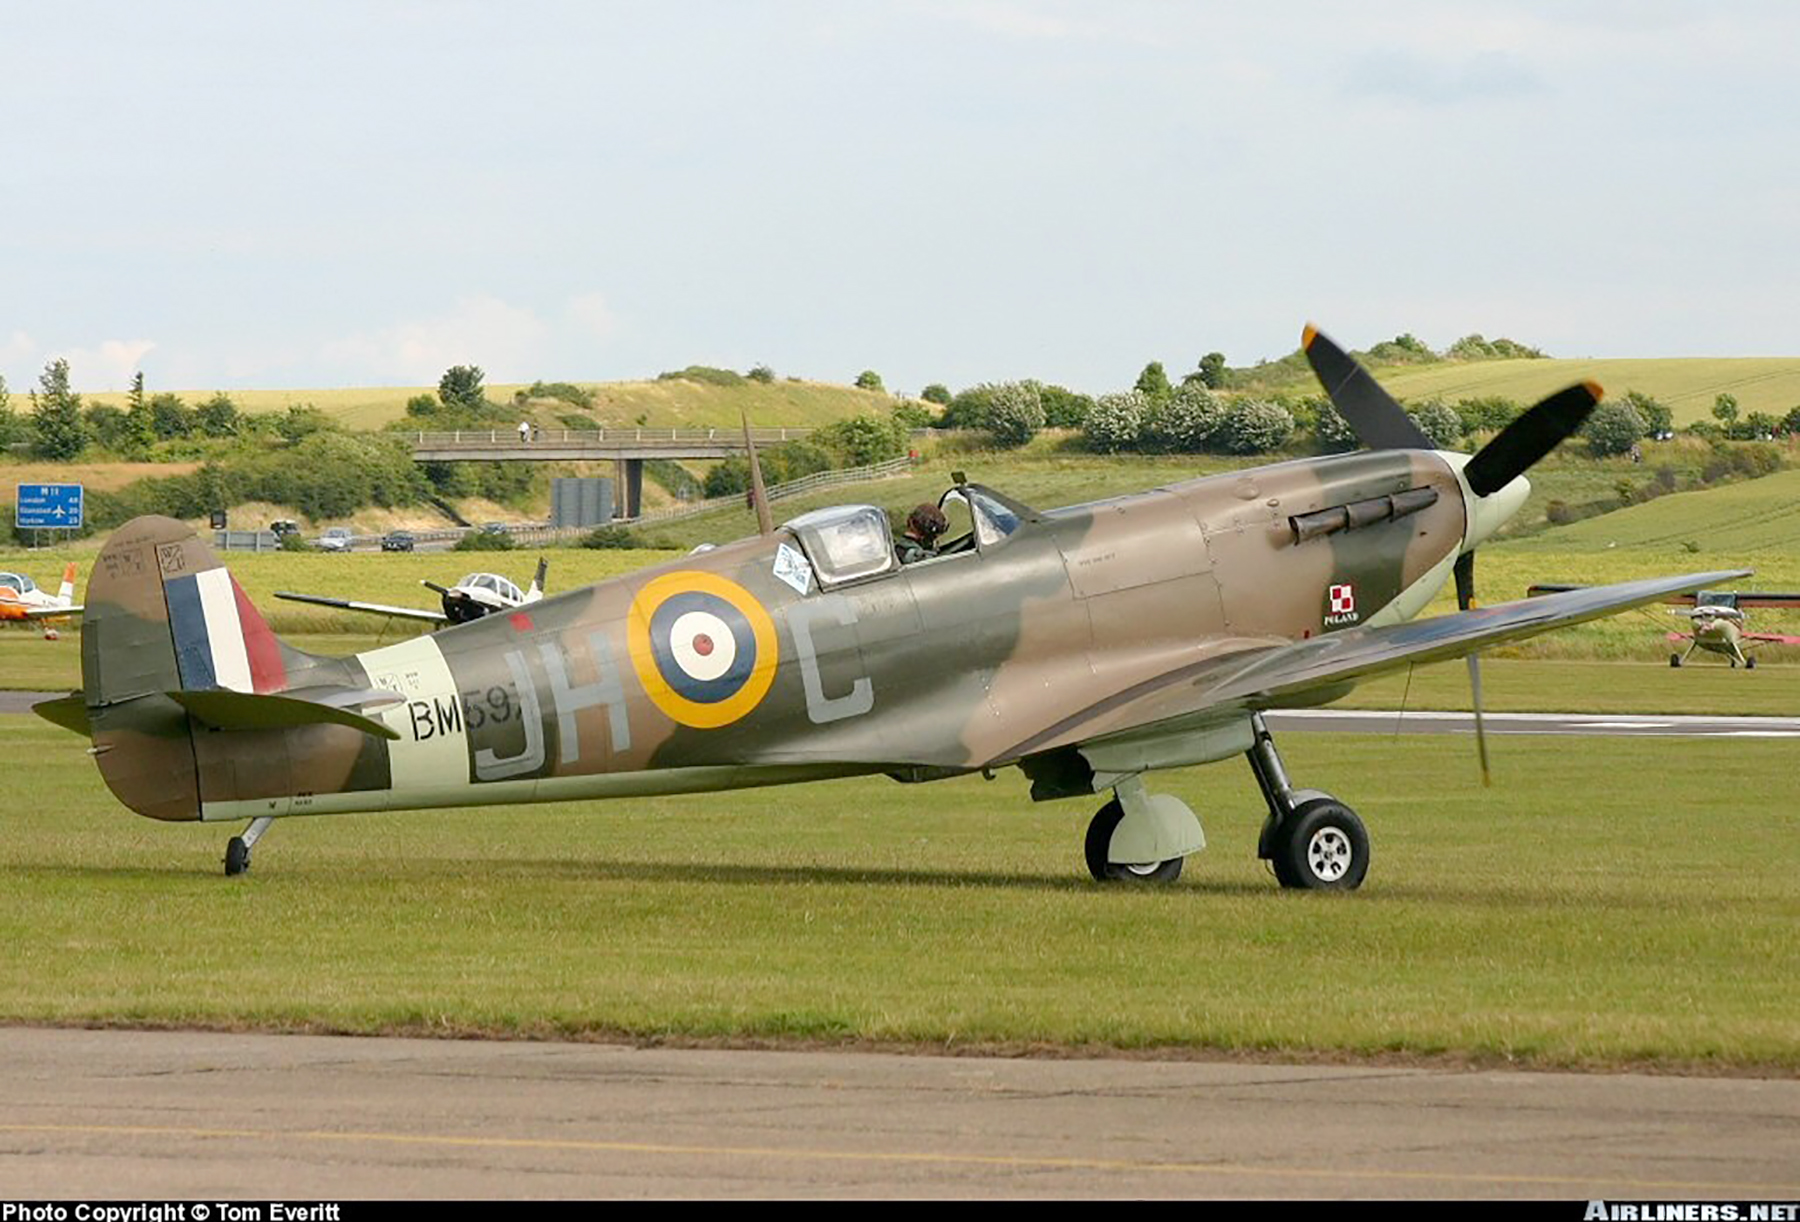 Airworthy Spitfire warbird MkVb RAF 317Sqn JHC BM597 G MKVB 04